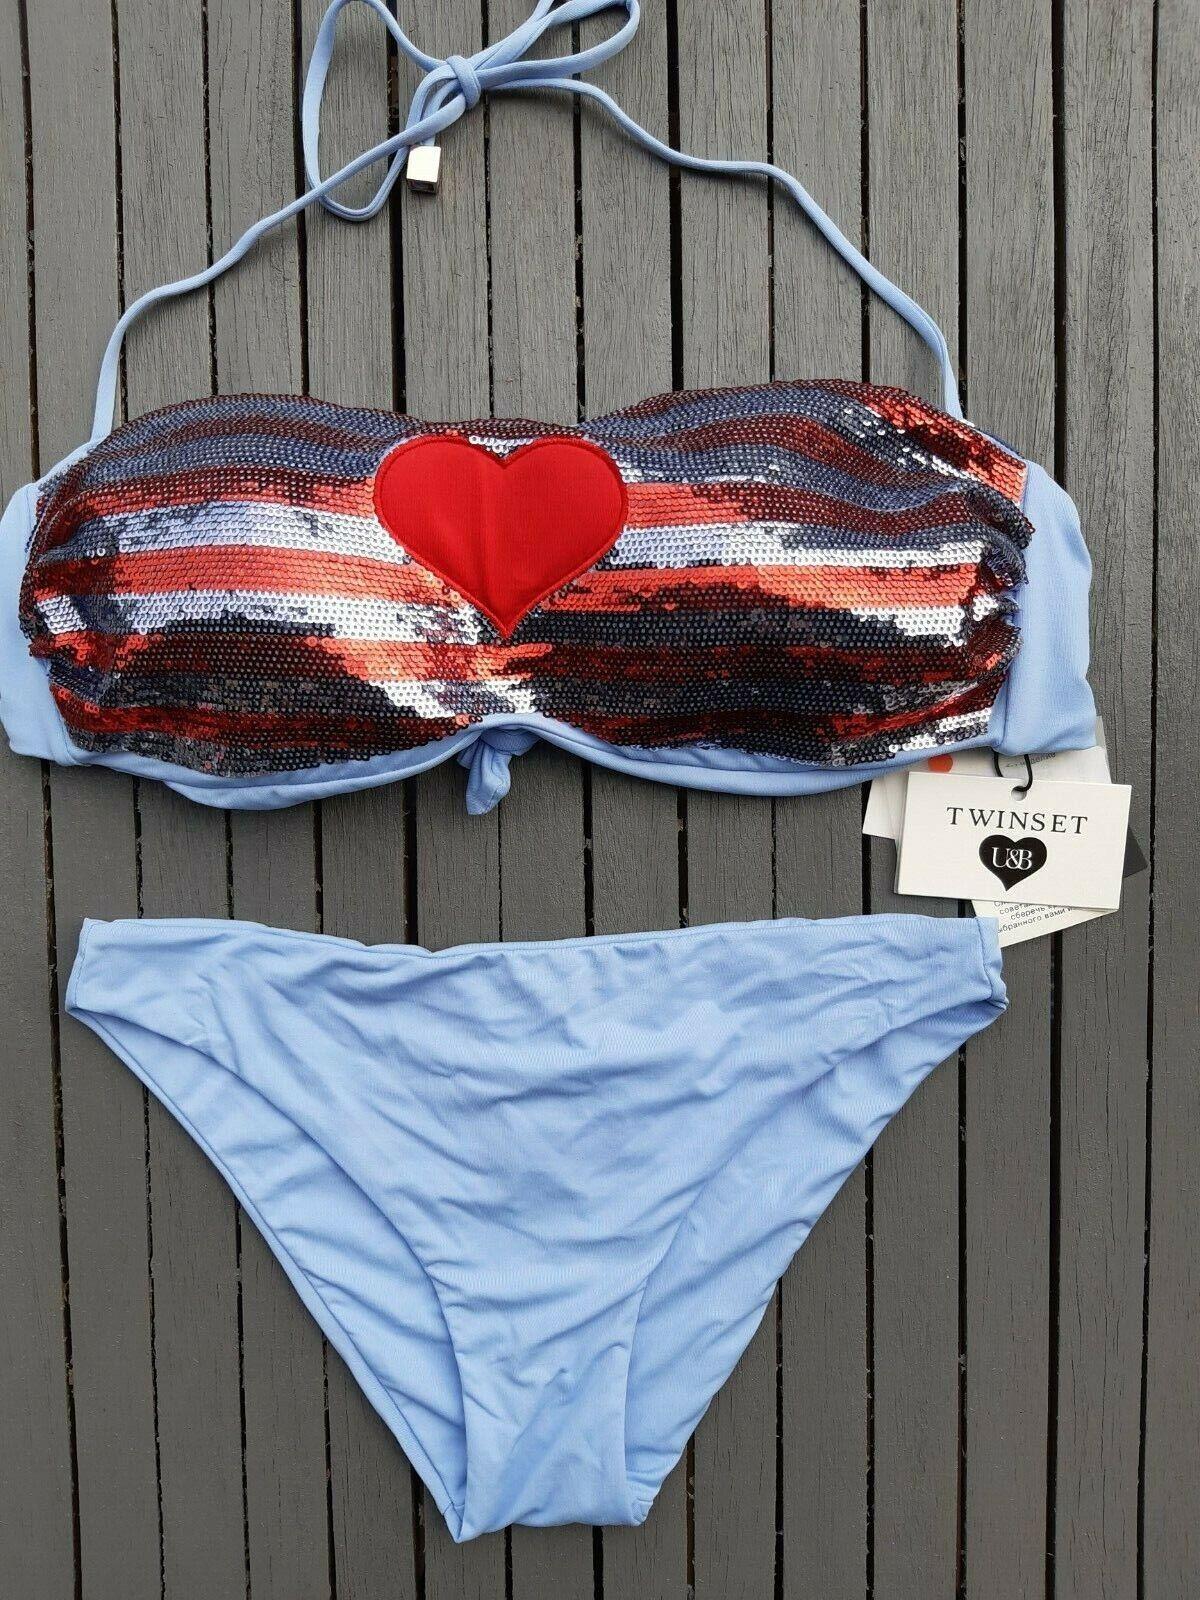 Twinset❤ Bikini mit Pailletten babyblau Bademode Gr.38 M / 85 Cup B Bandeau